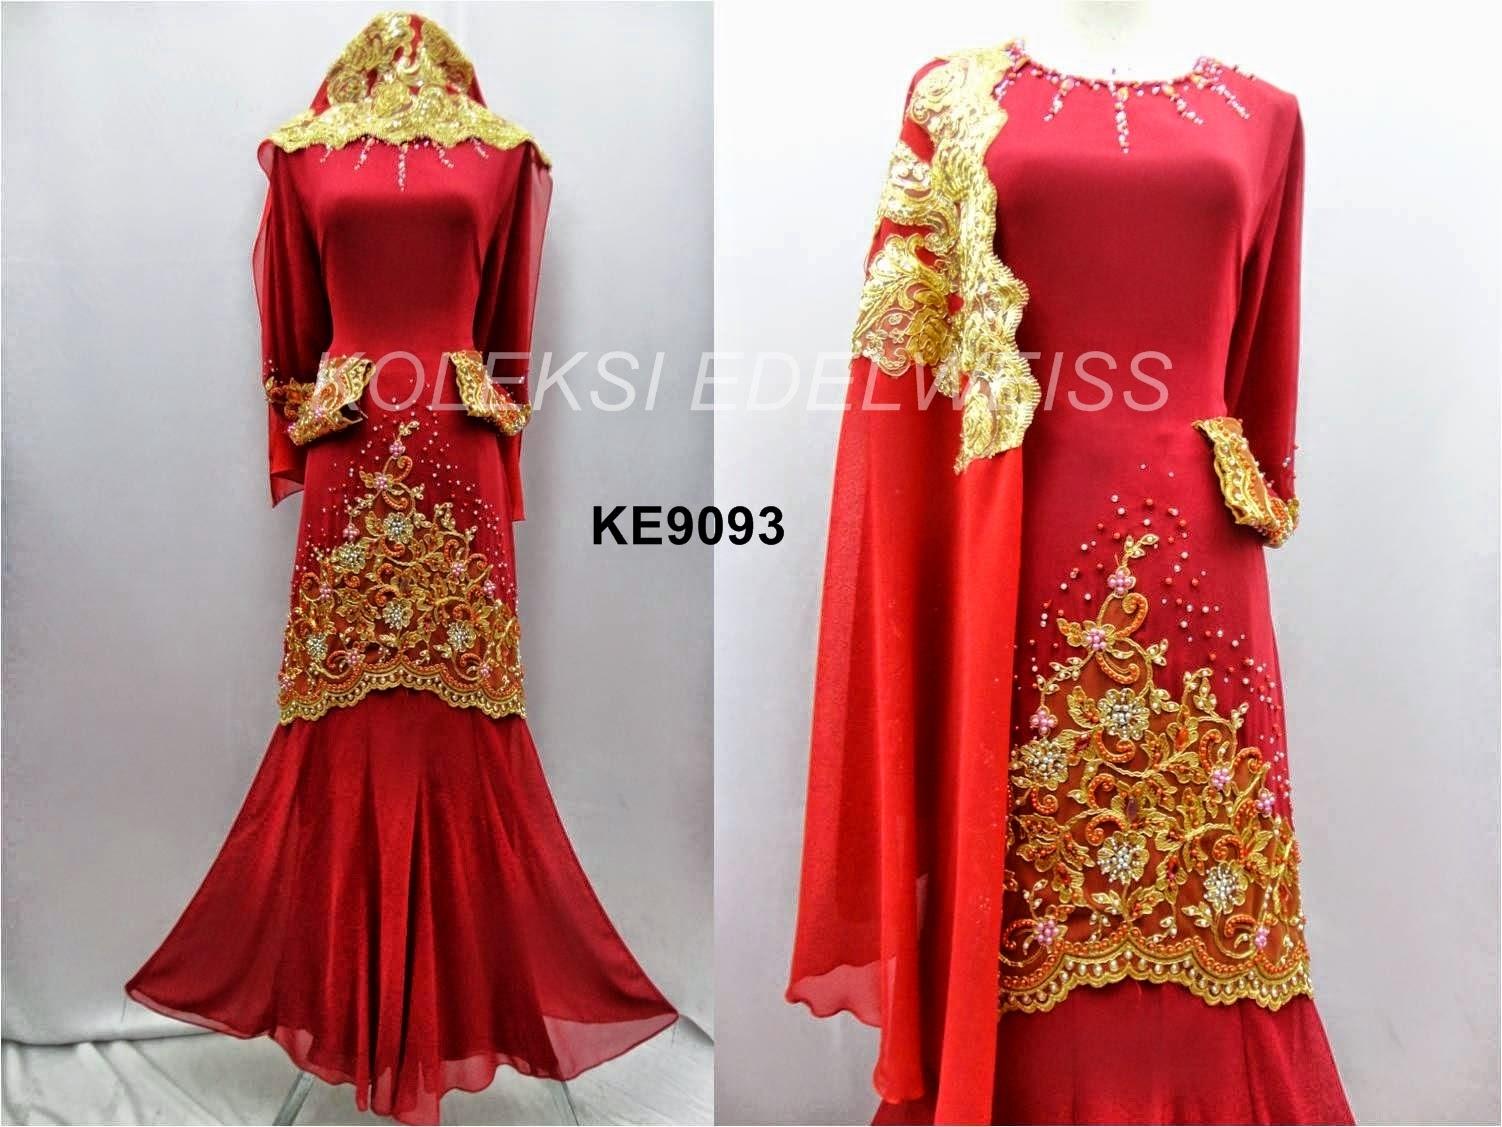 Baju Kurung Moden Tunang dan Nikah Warna Merah